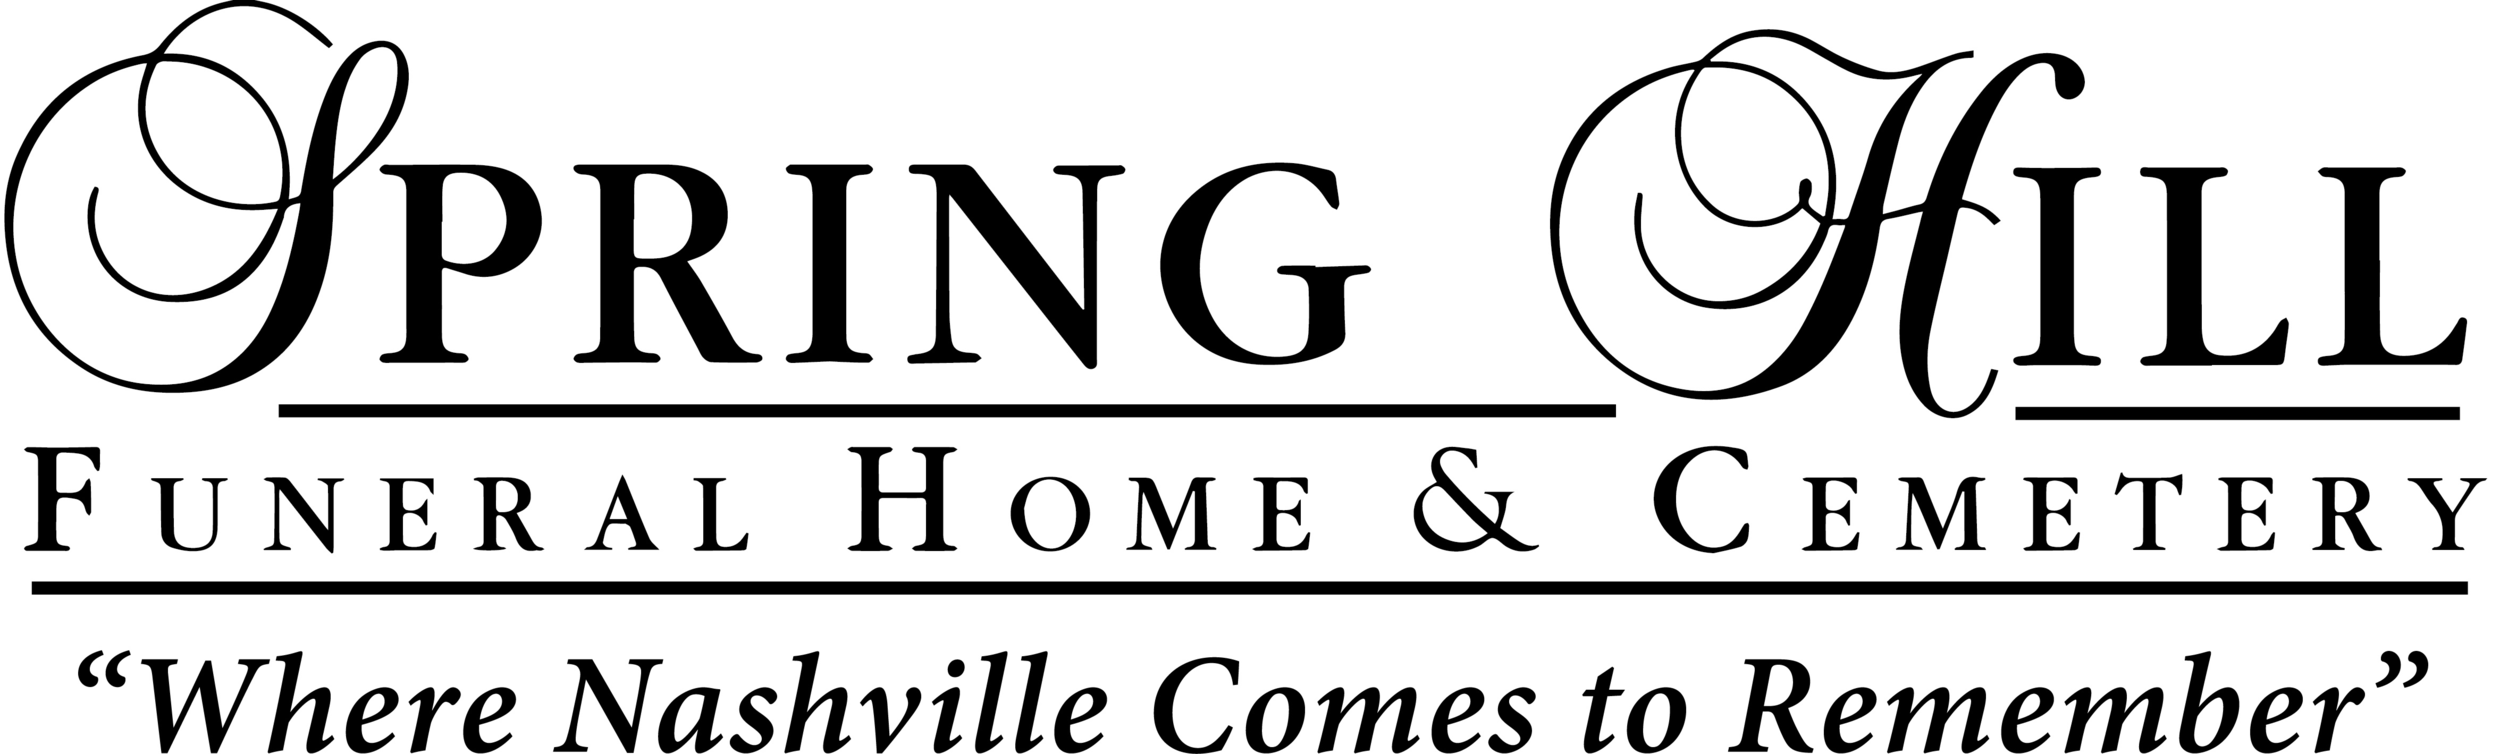 Spring Hill Logo & Slogan.png